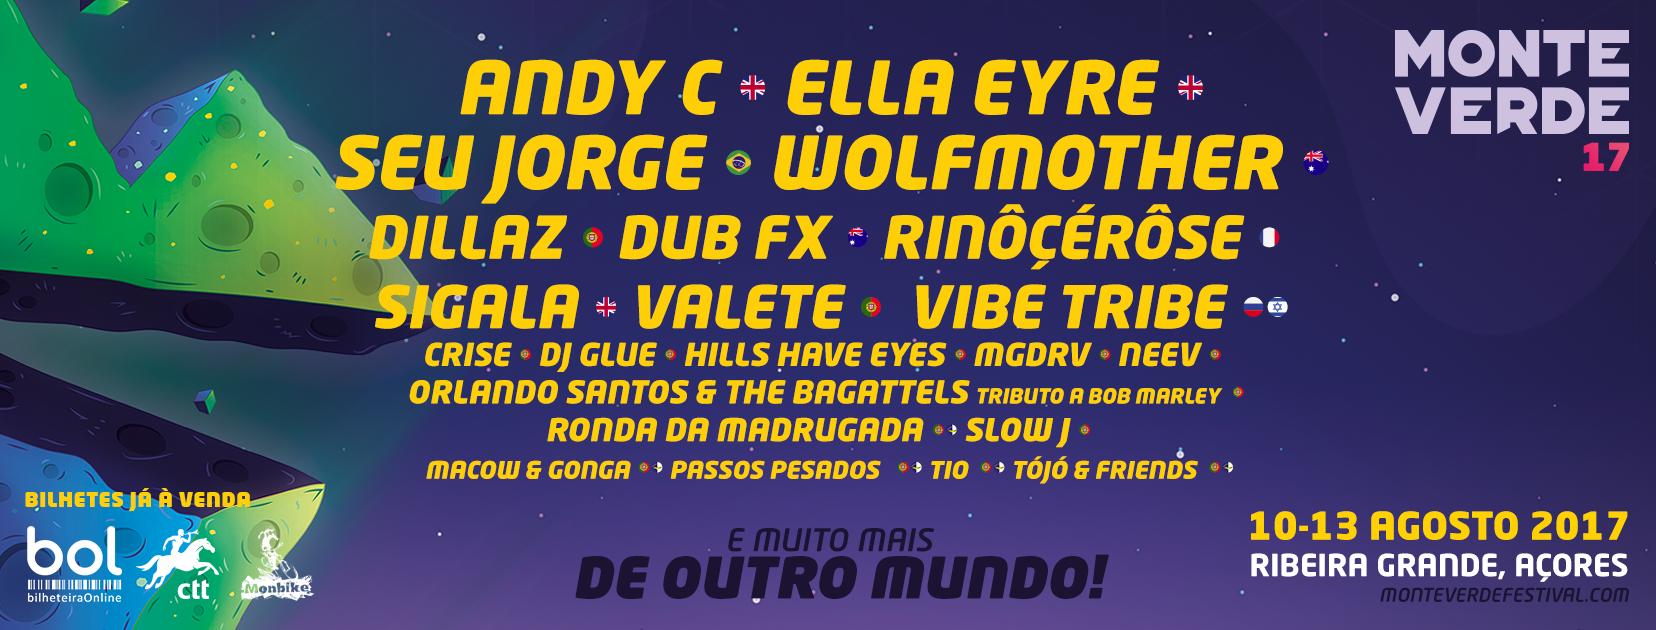 Cartaz Monte Verde Festival 2017